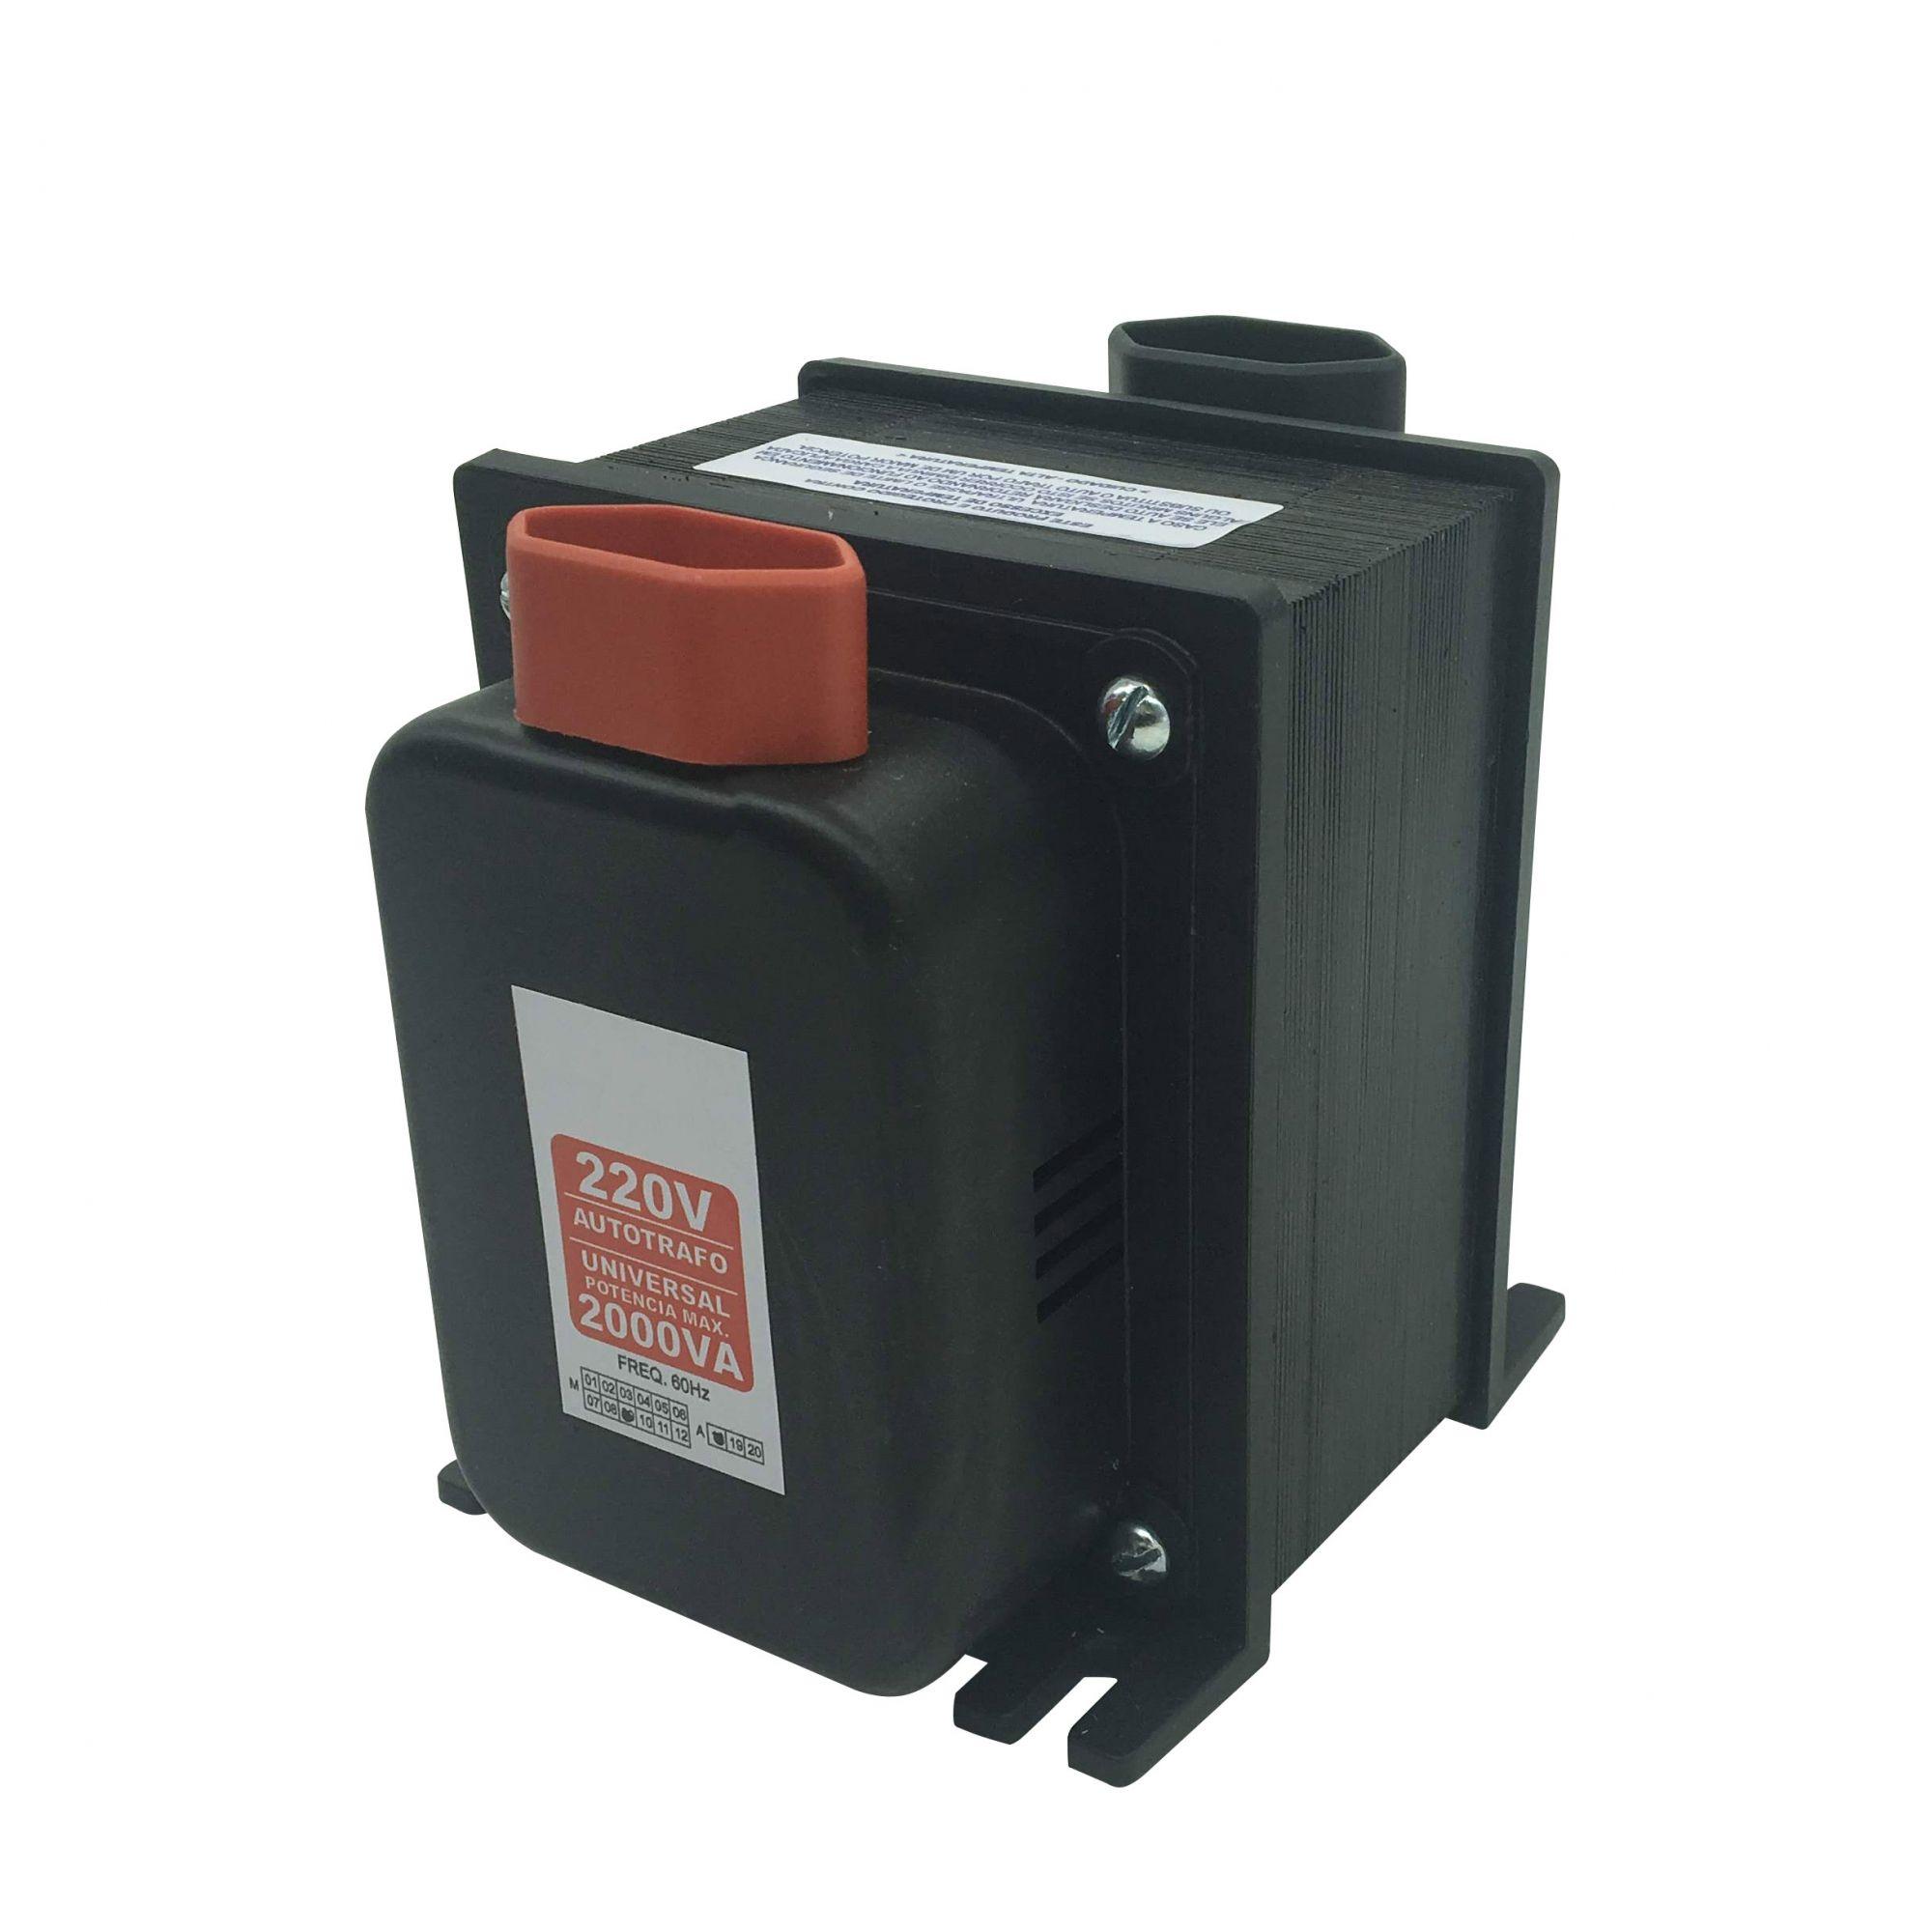 Autotransformador Automático 2000VA 110/220 220/110 - Bivolt